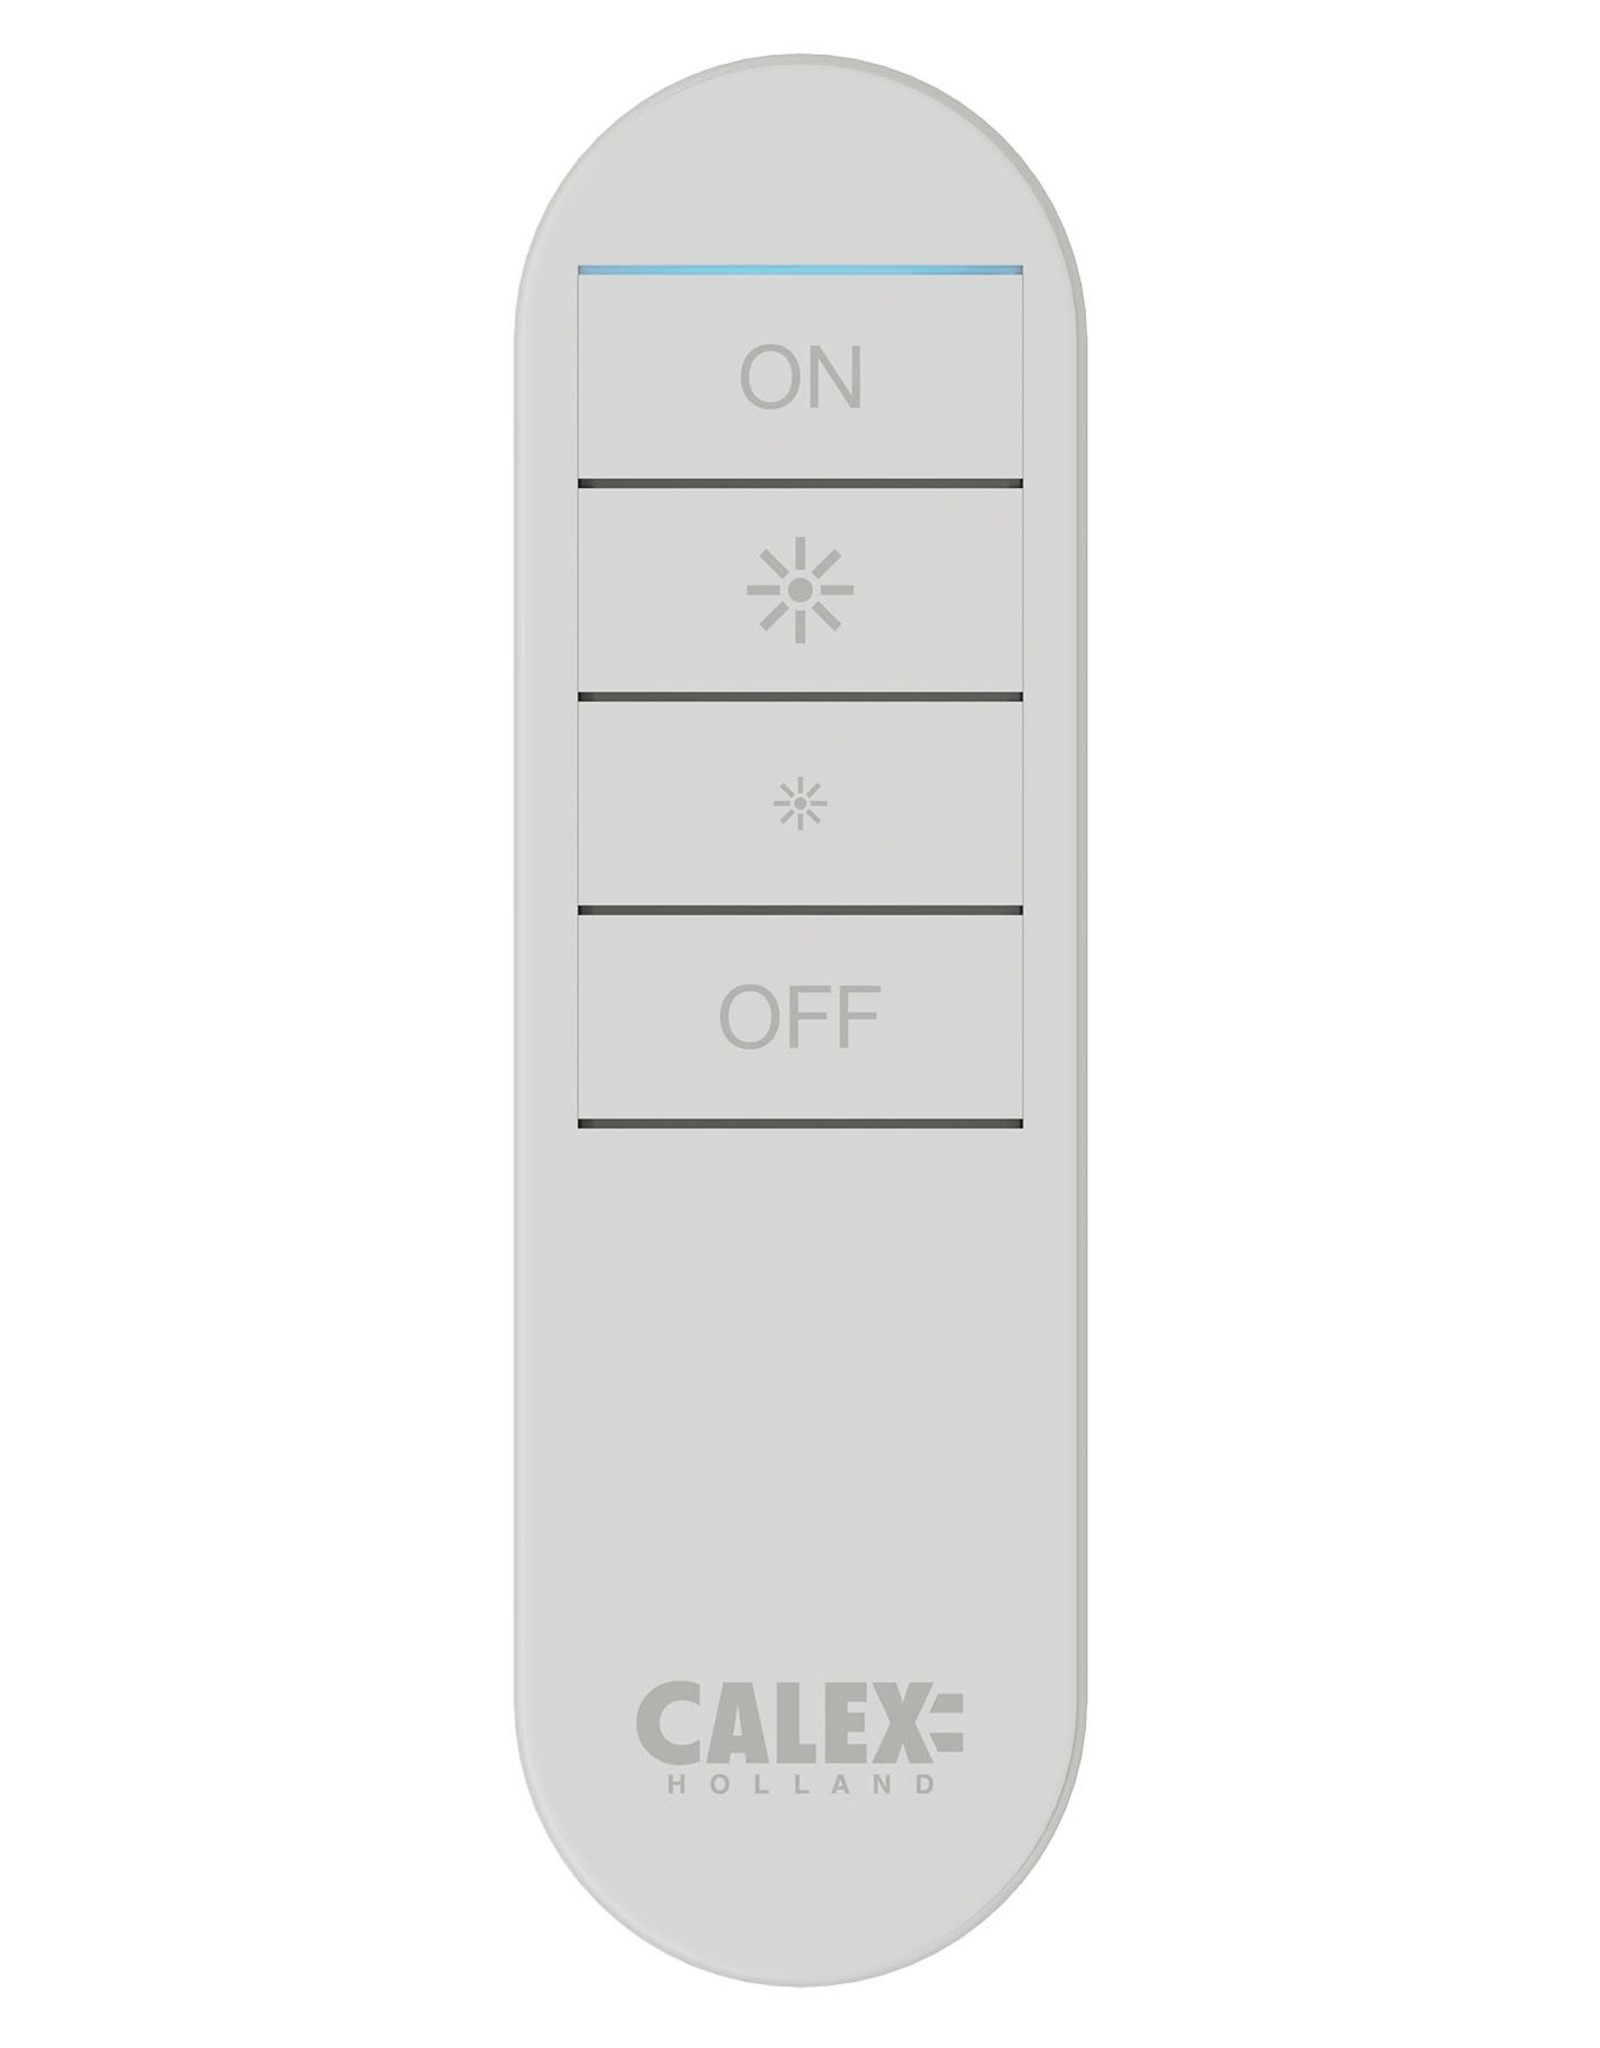 Calex Calex Smart connect Remotecontrol